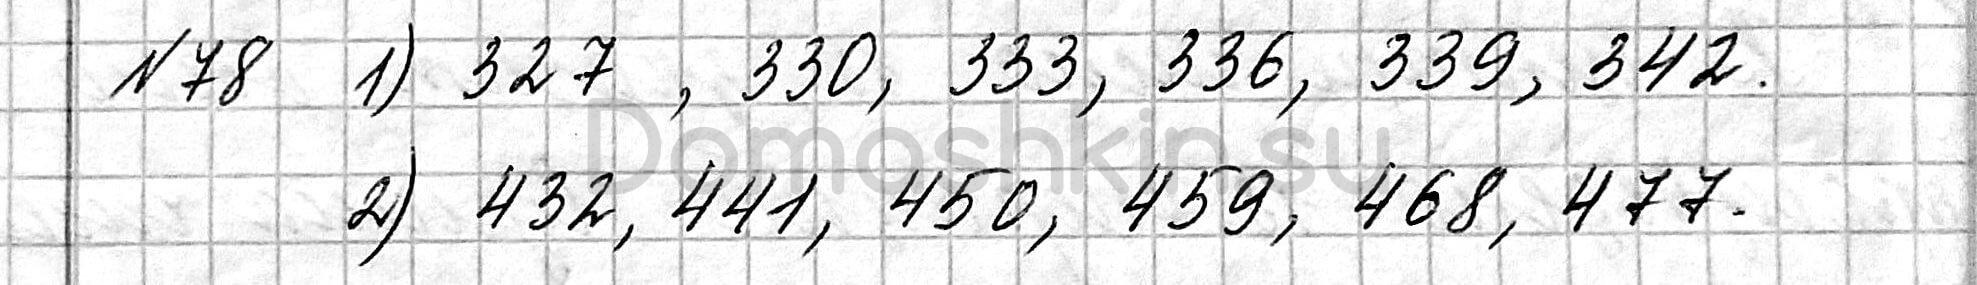 Математика 6 класс учебник Мерзляк номер 78 решение